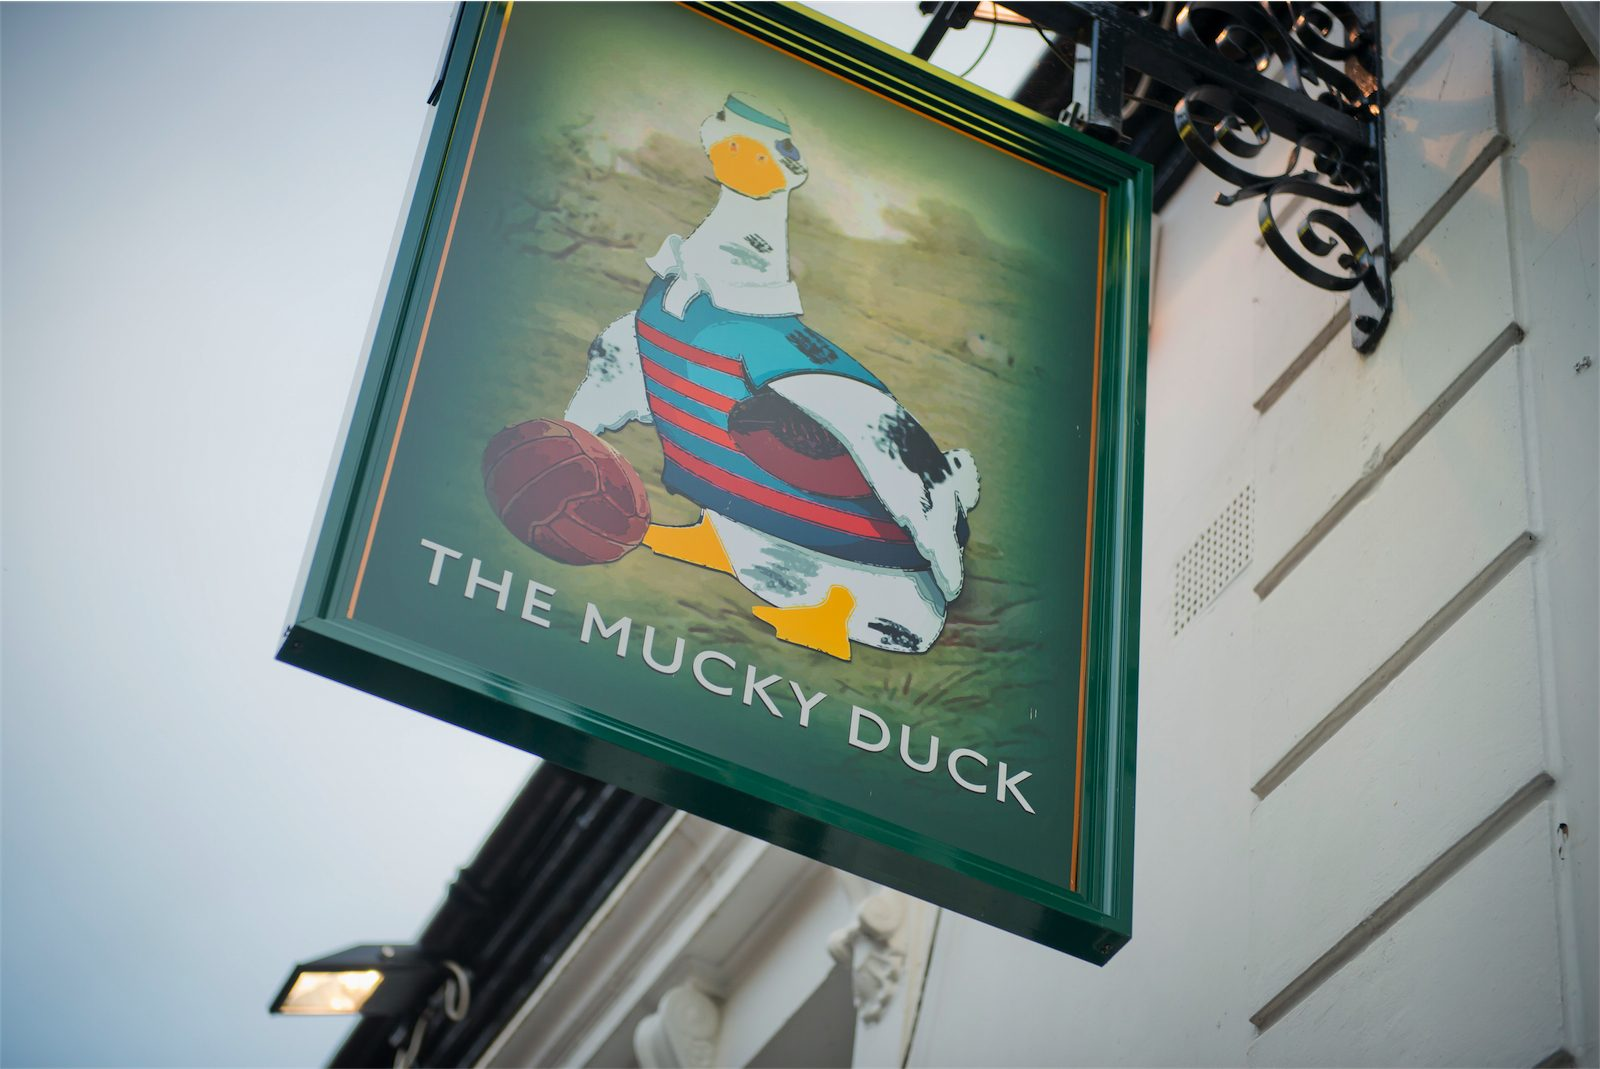 the-mucky-duck-pub-winchester-065